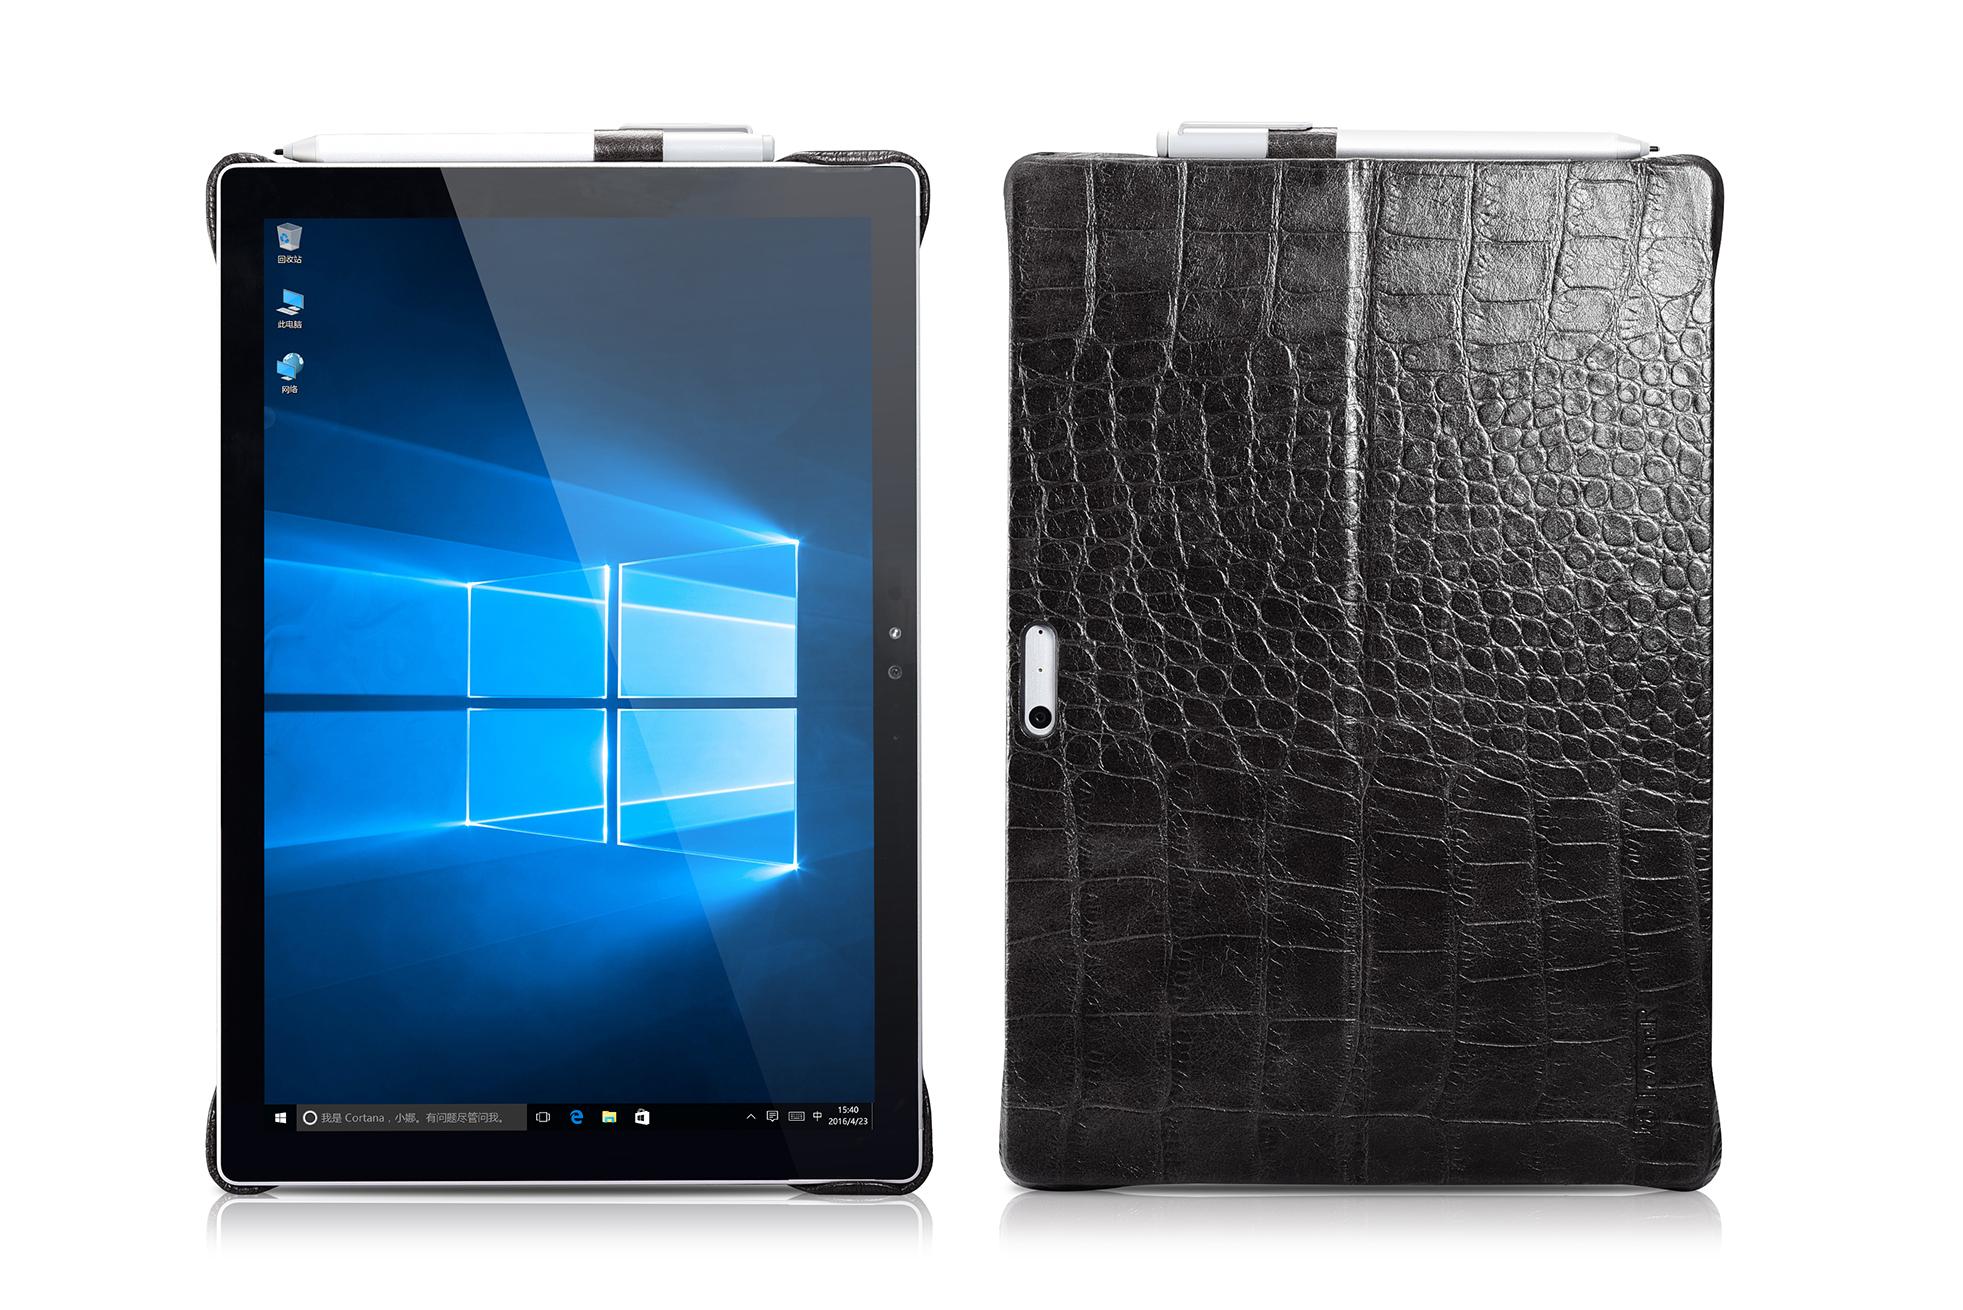 Ốp lưng Surface Pro 4 / Pro 5/ Pro 6 / Pro 7 ICARER - Hàng chính hãng